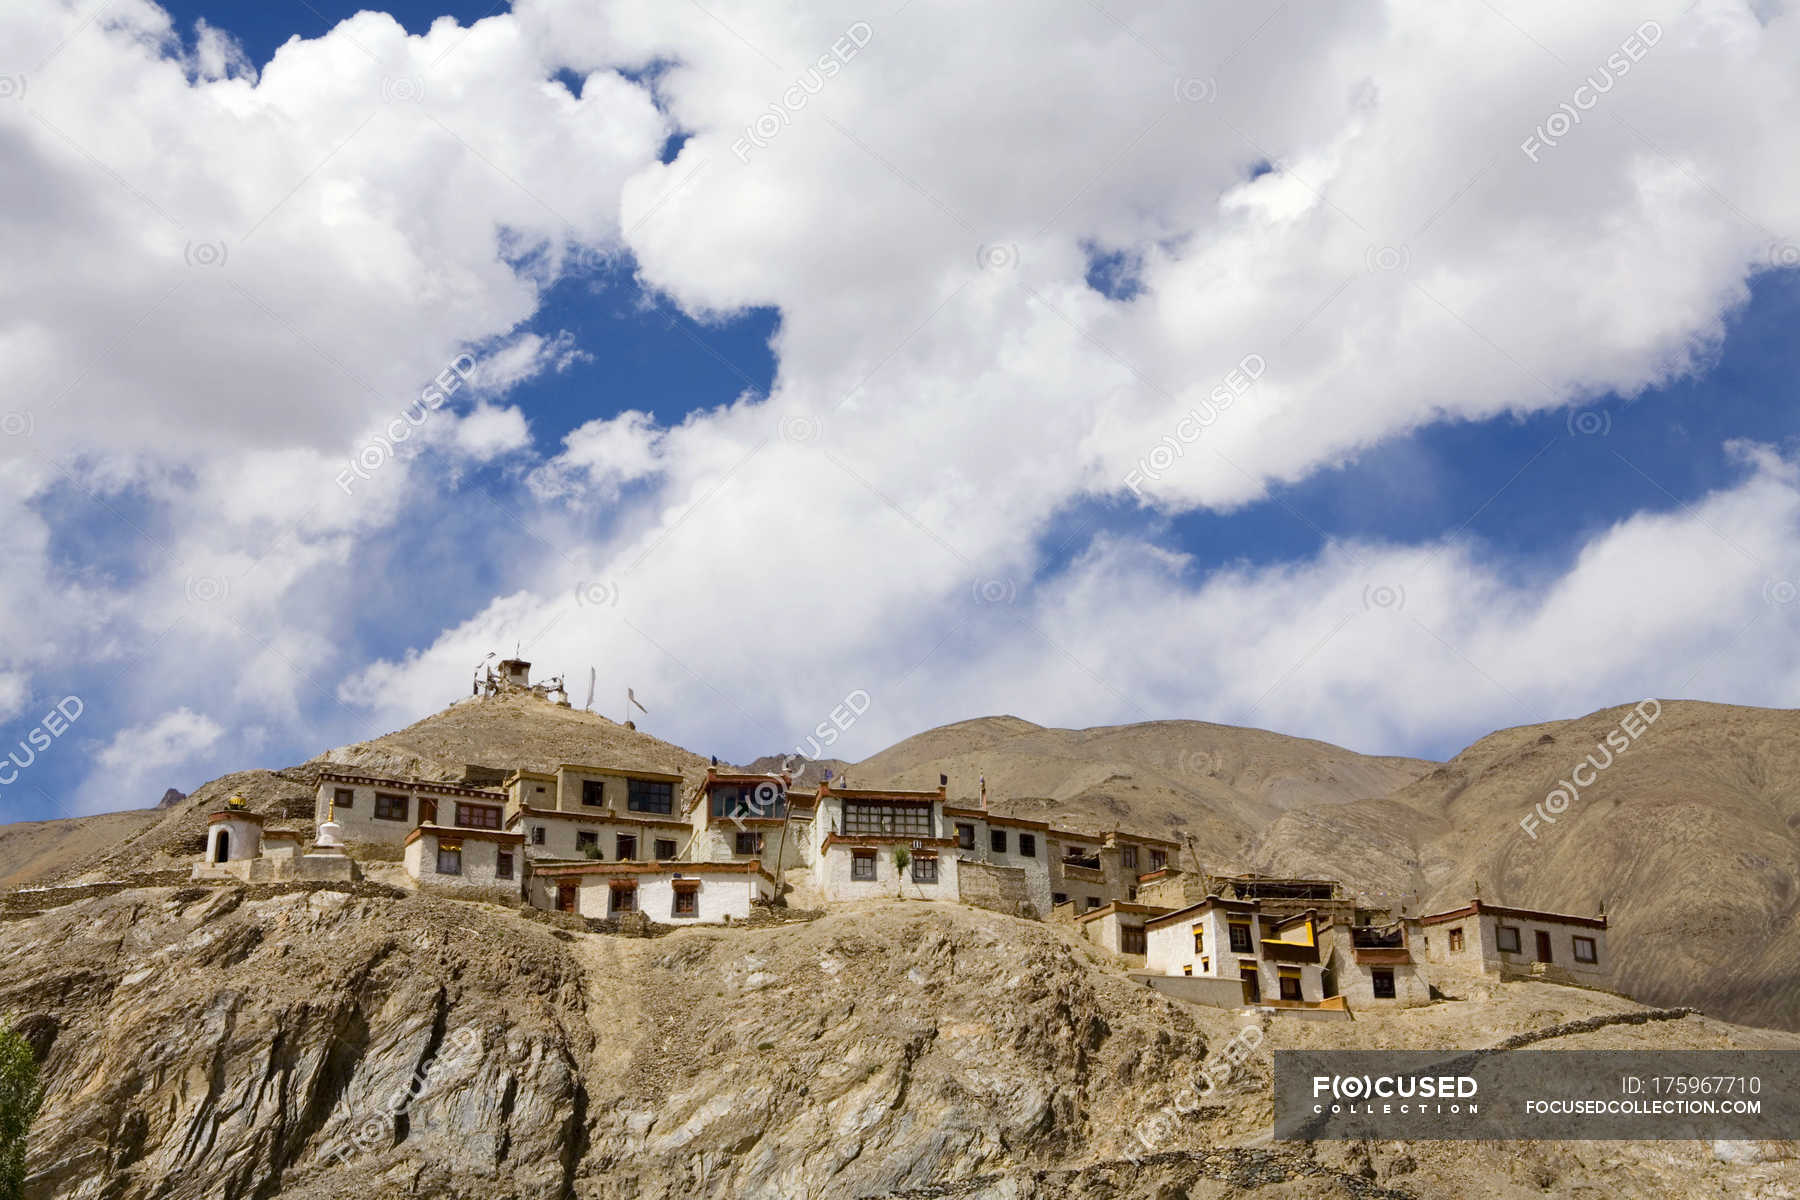 Meditation cells of the Lamayuru Buddhist Monastery rising